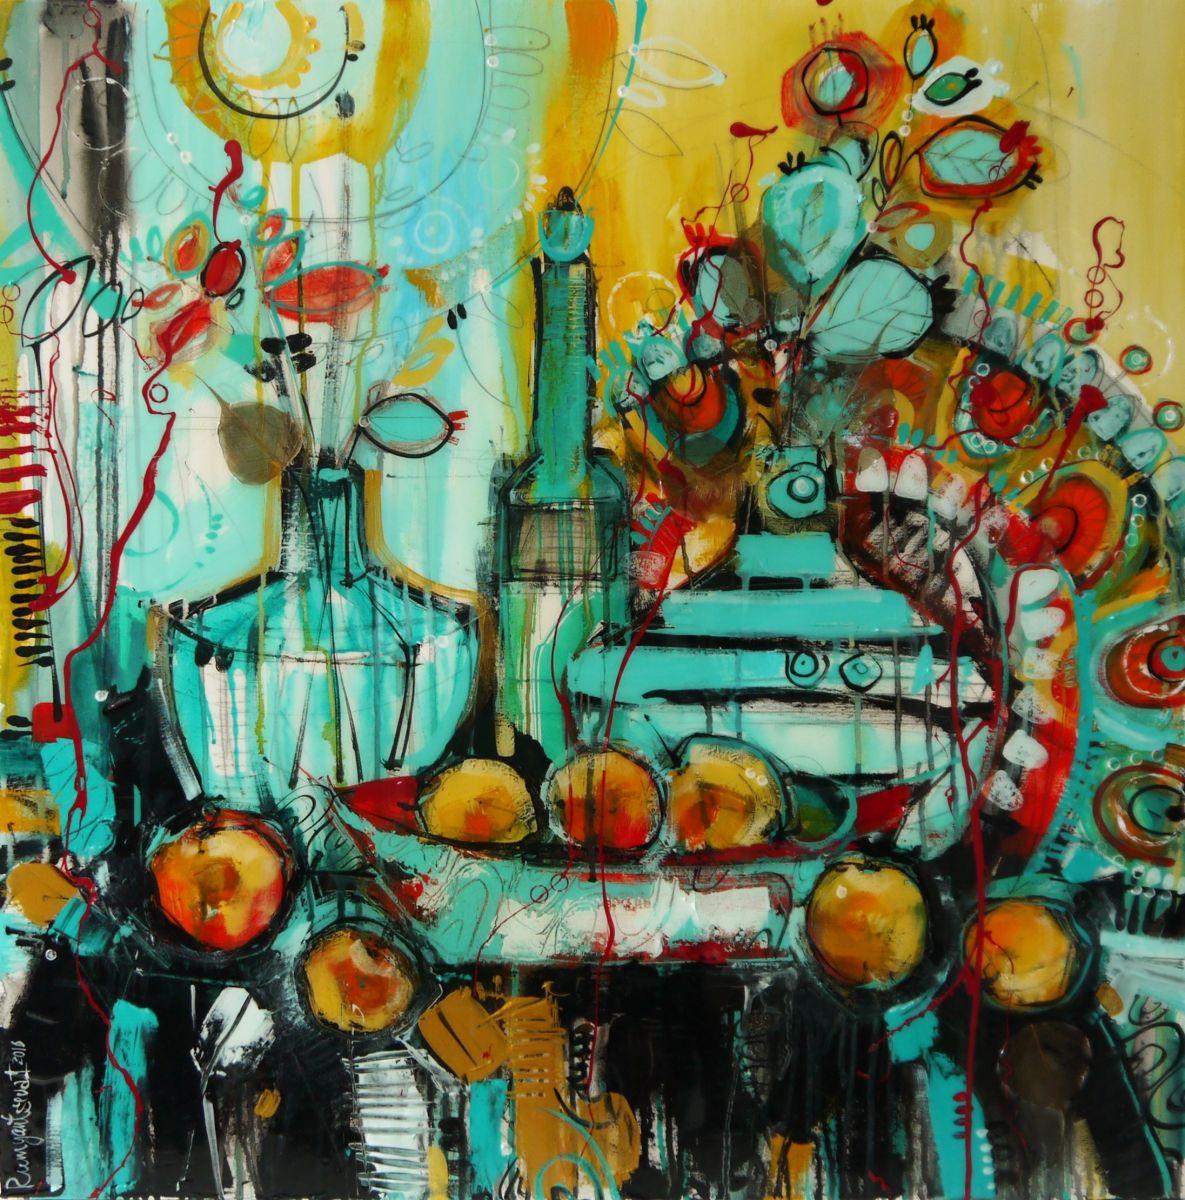 Fruit Table 2016 Acrylic Painting By Irina Rumyantseva